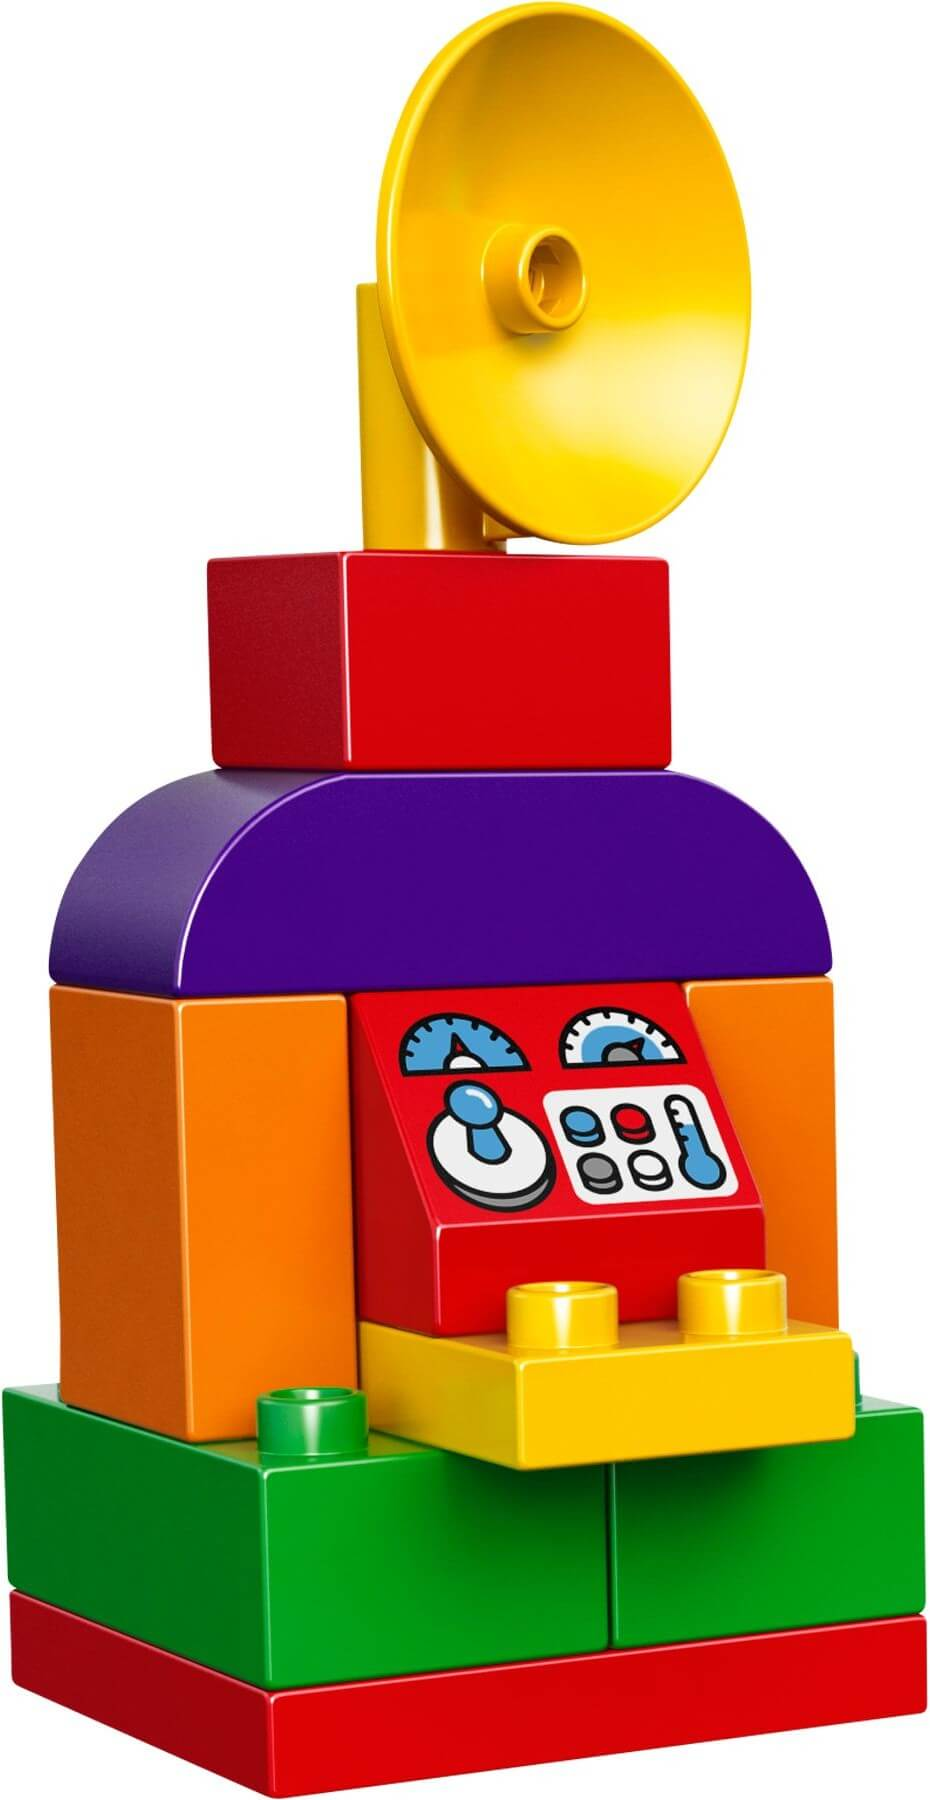 Mua đồ chơi LEGO 10544 - LEGO DUPLO 10544 - Thách Thức Của The Joker (LEGO DUPLO The Joker Challenge 10544)